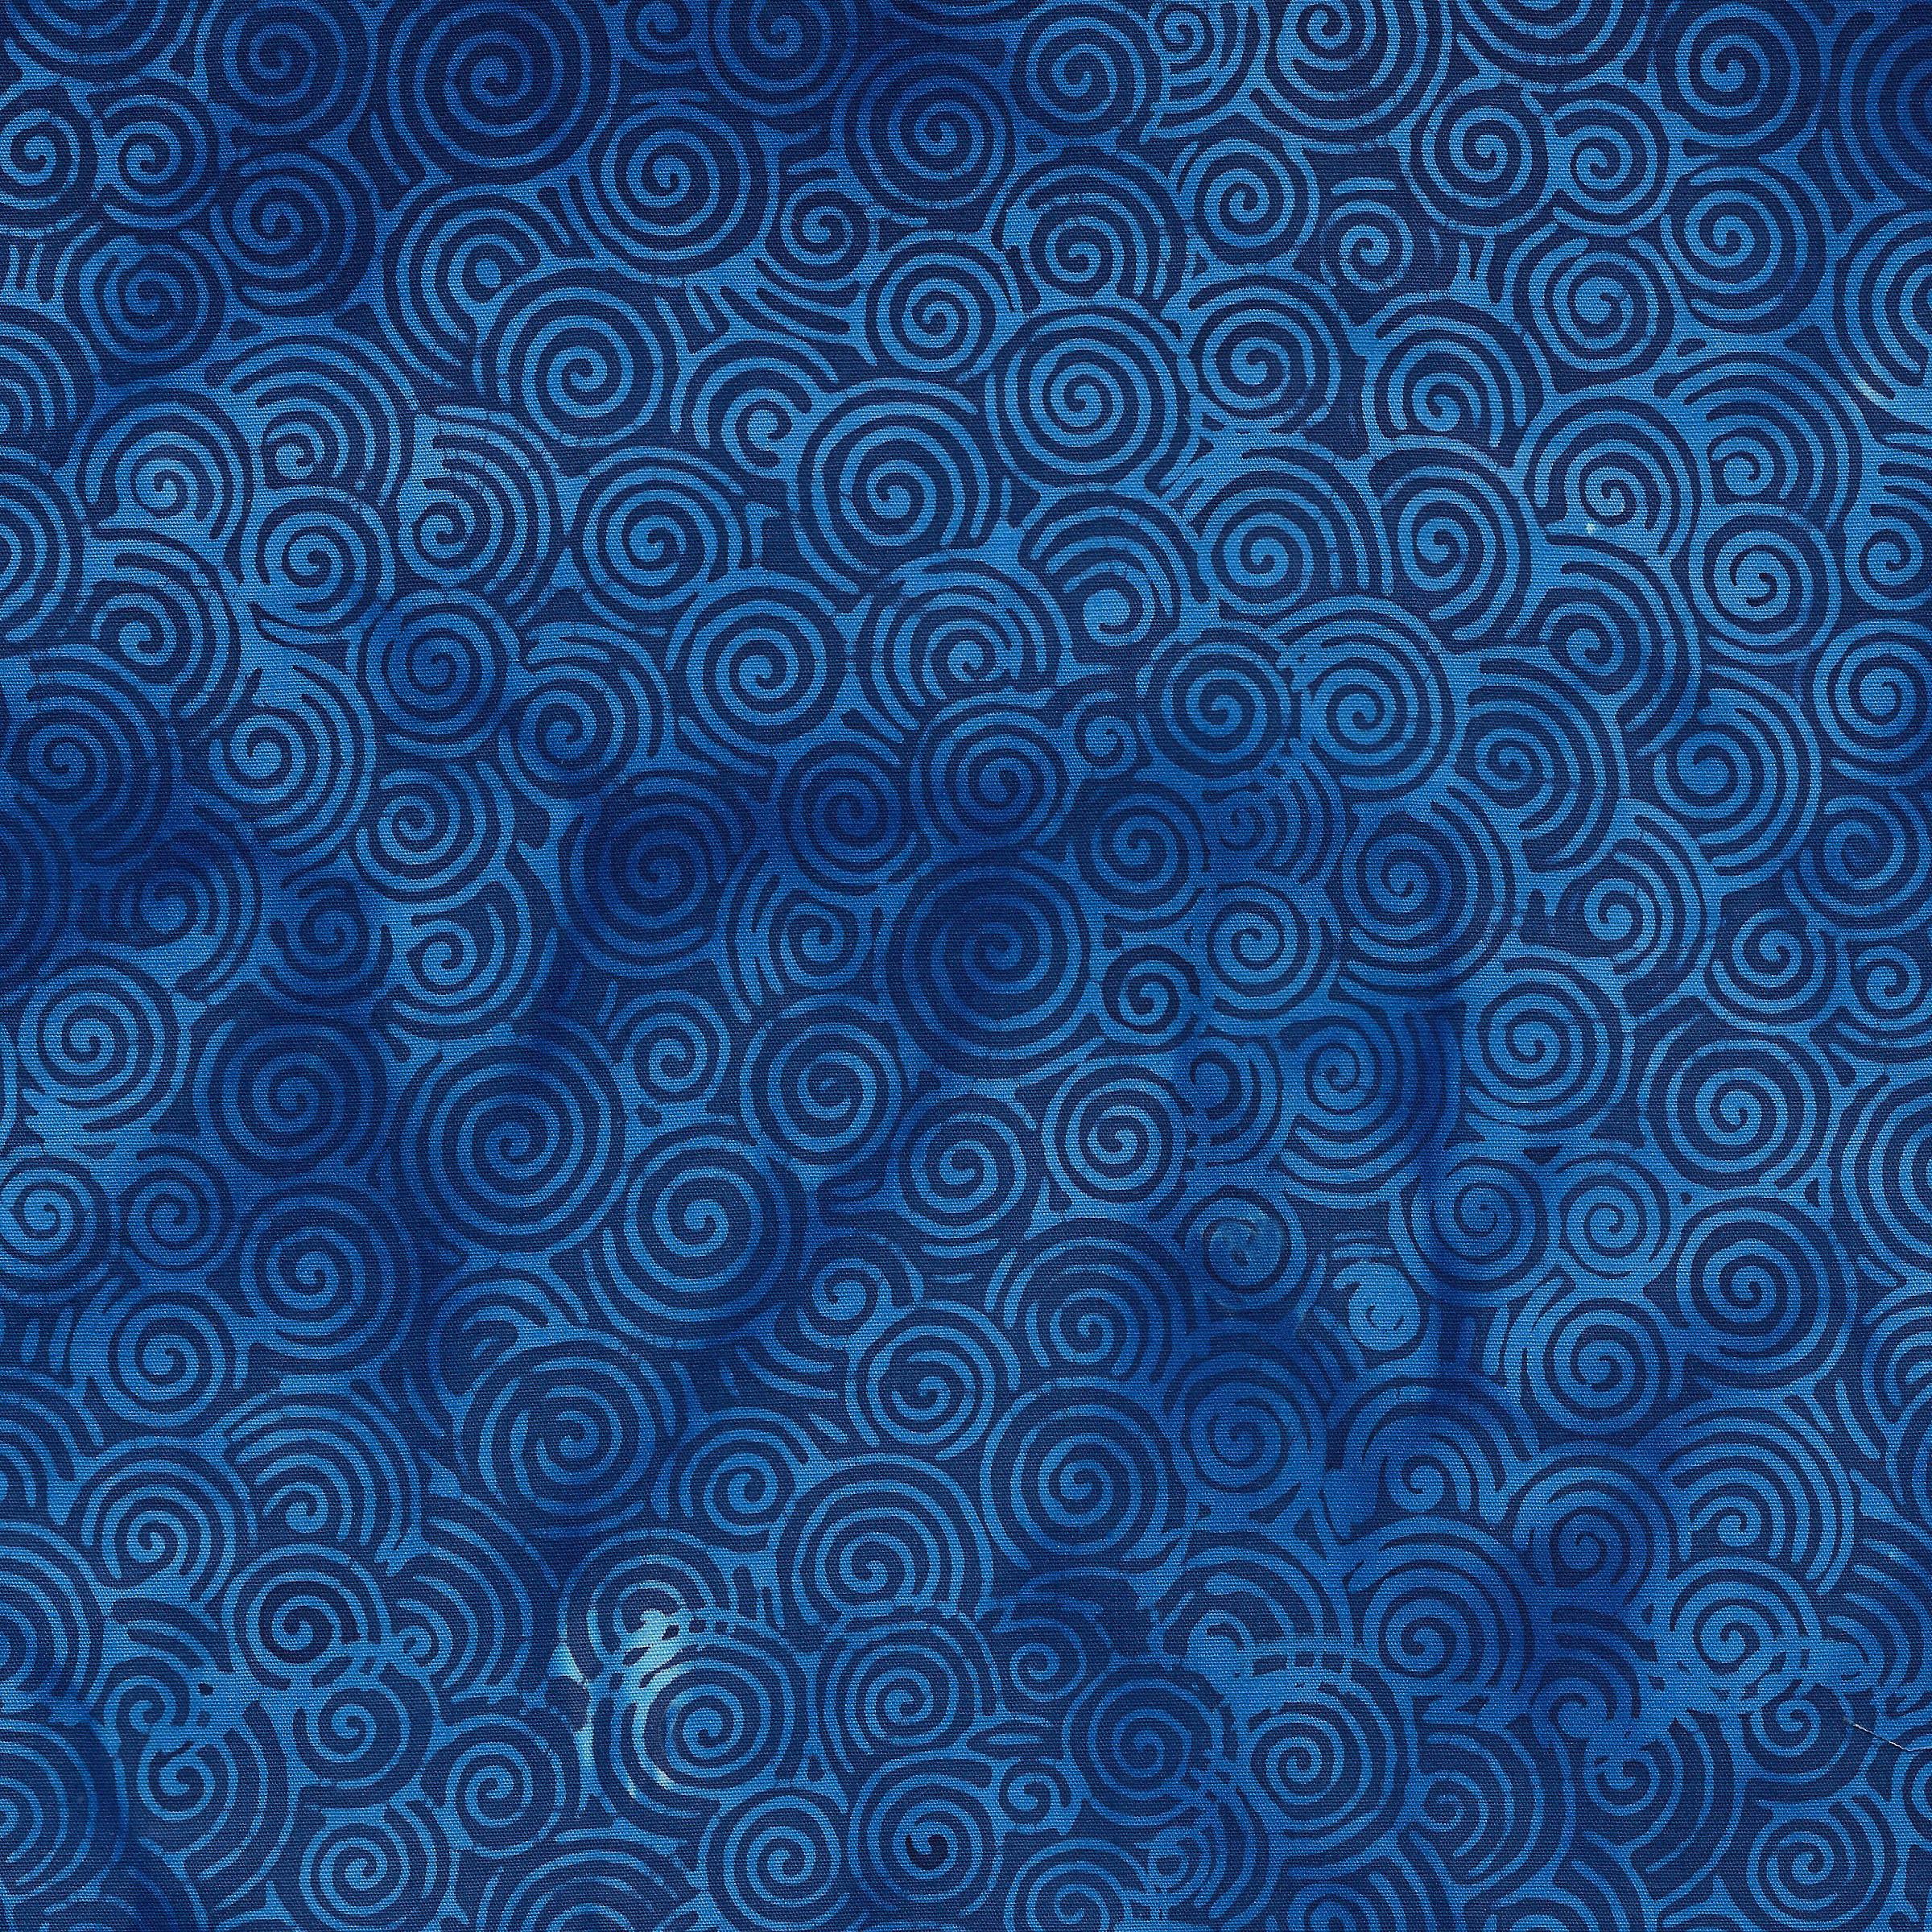 111908532 / Swirls-Royal